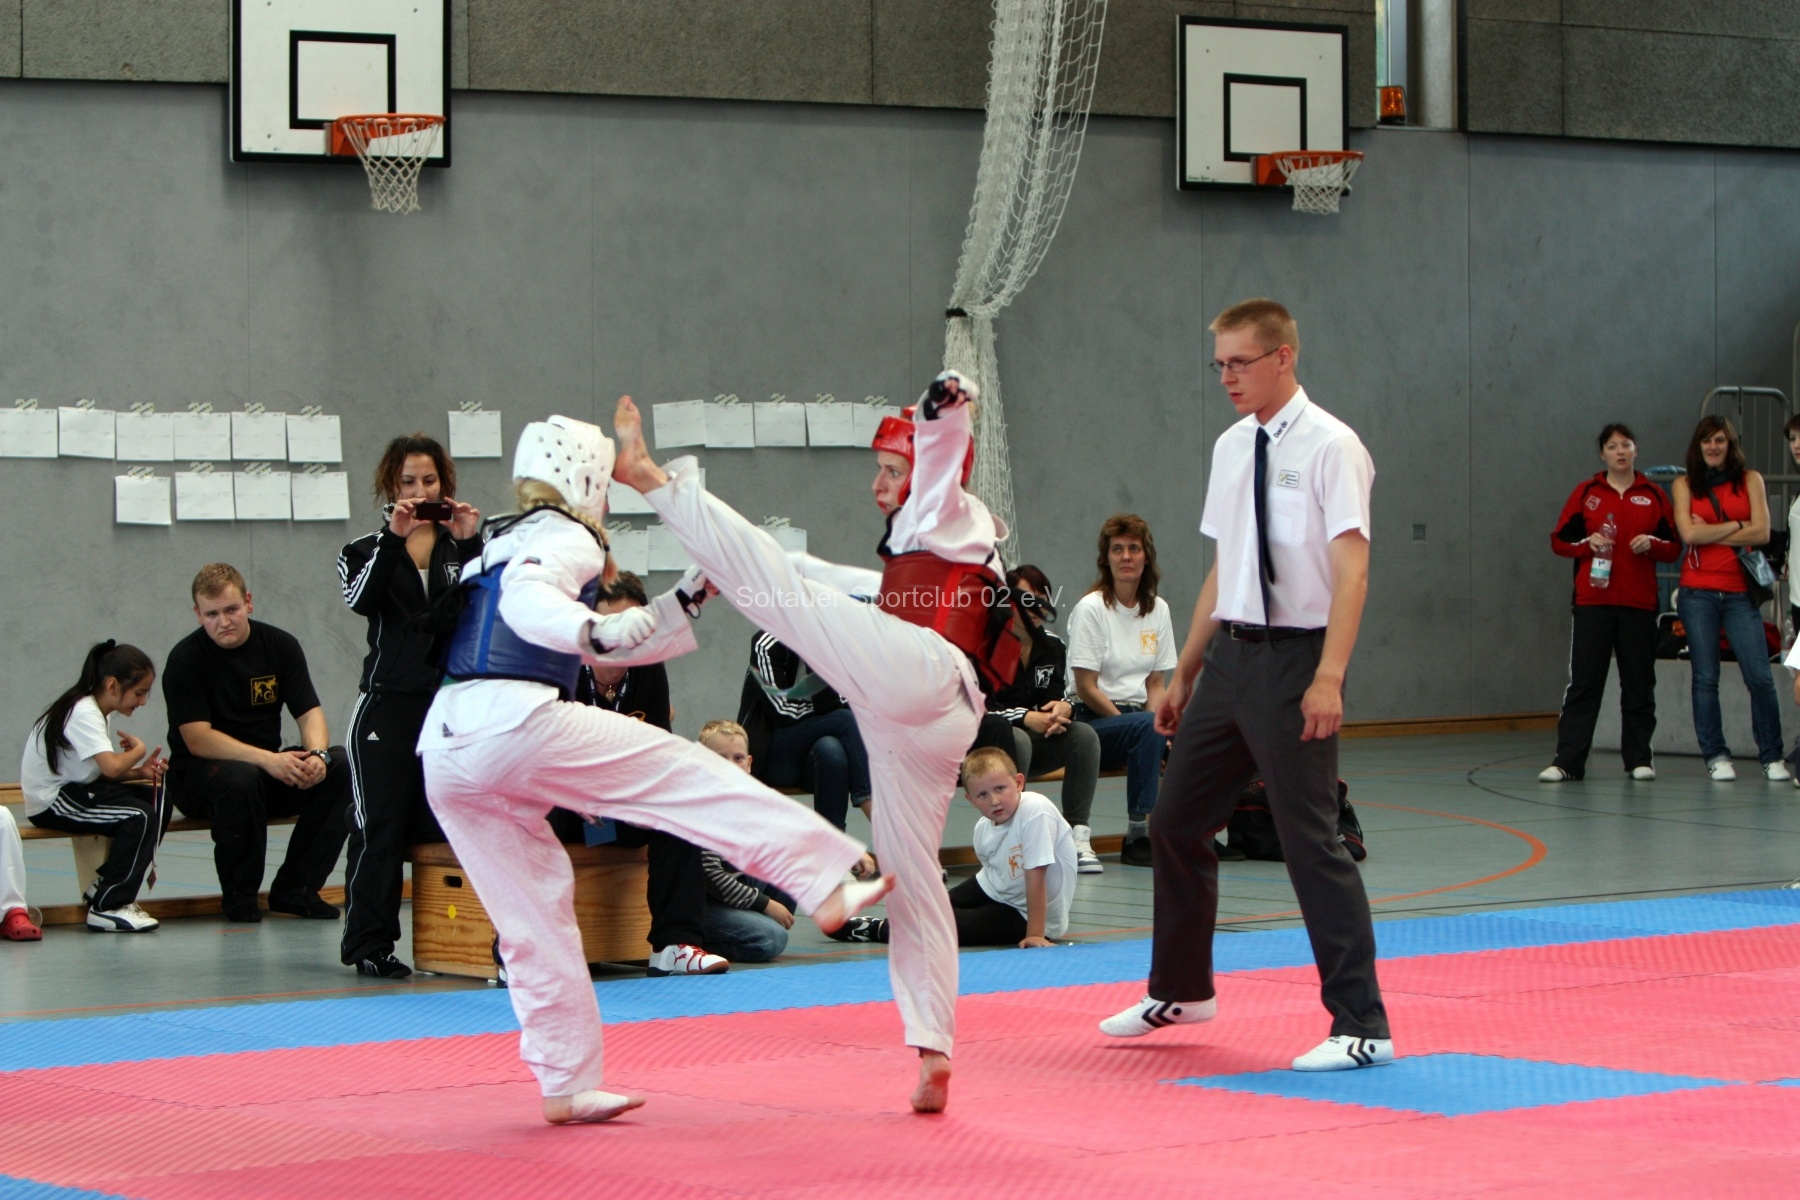 2010-09-11-tkd-turnier-pinneberg-317